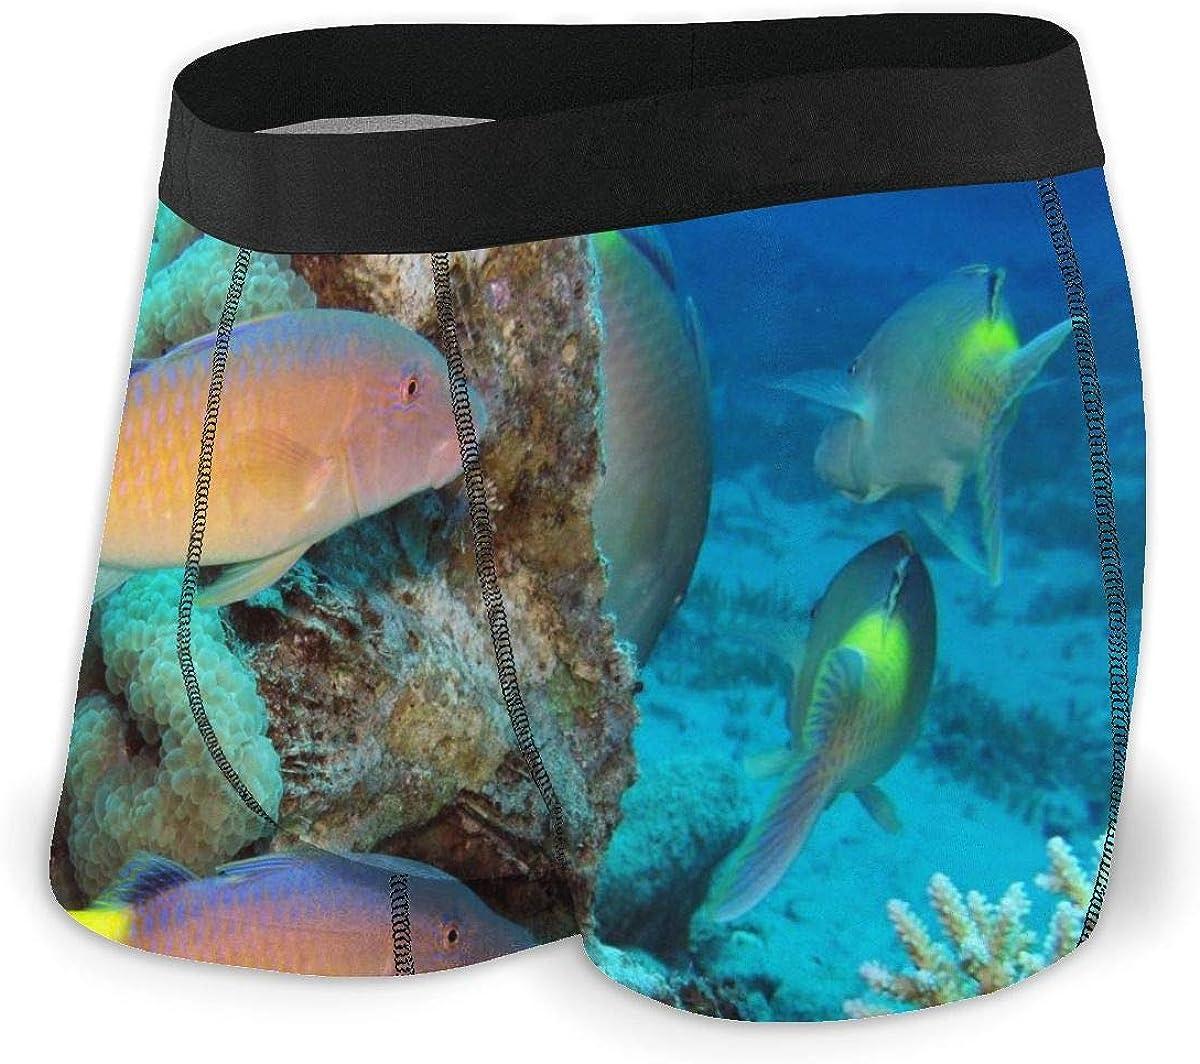 Randolph Wordsworth Mens Boxer Briefs Cute Funny Coral Goat Fish Boys Trunks Underwear Short Leg Breathable Man